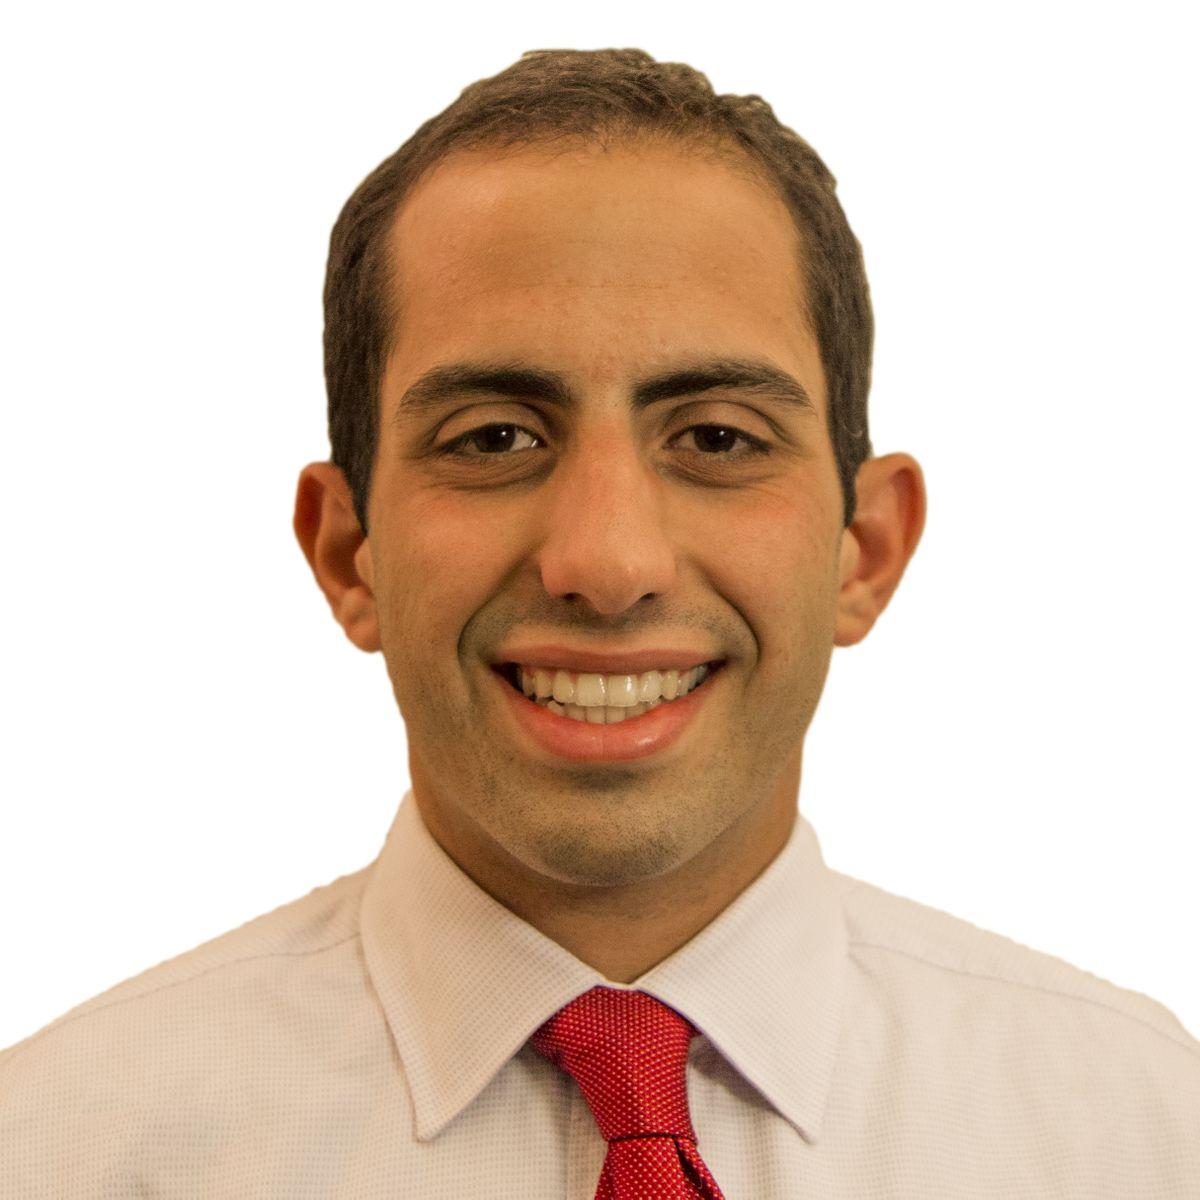 Joshua Khalili